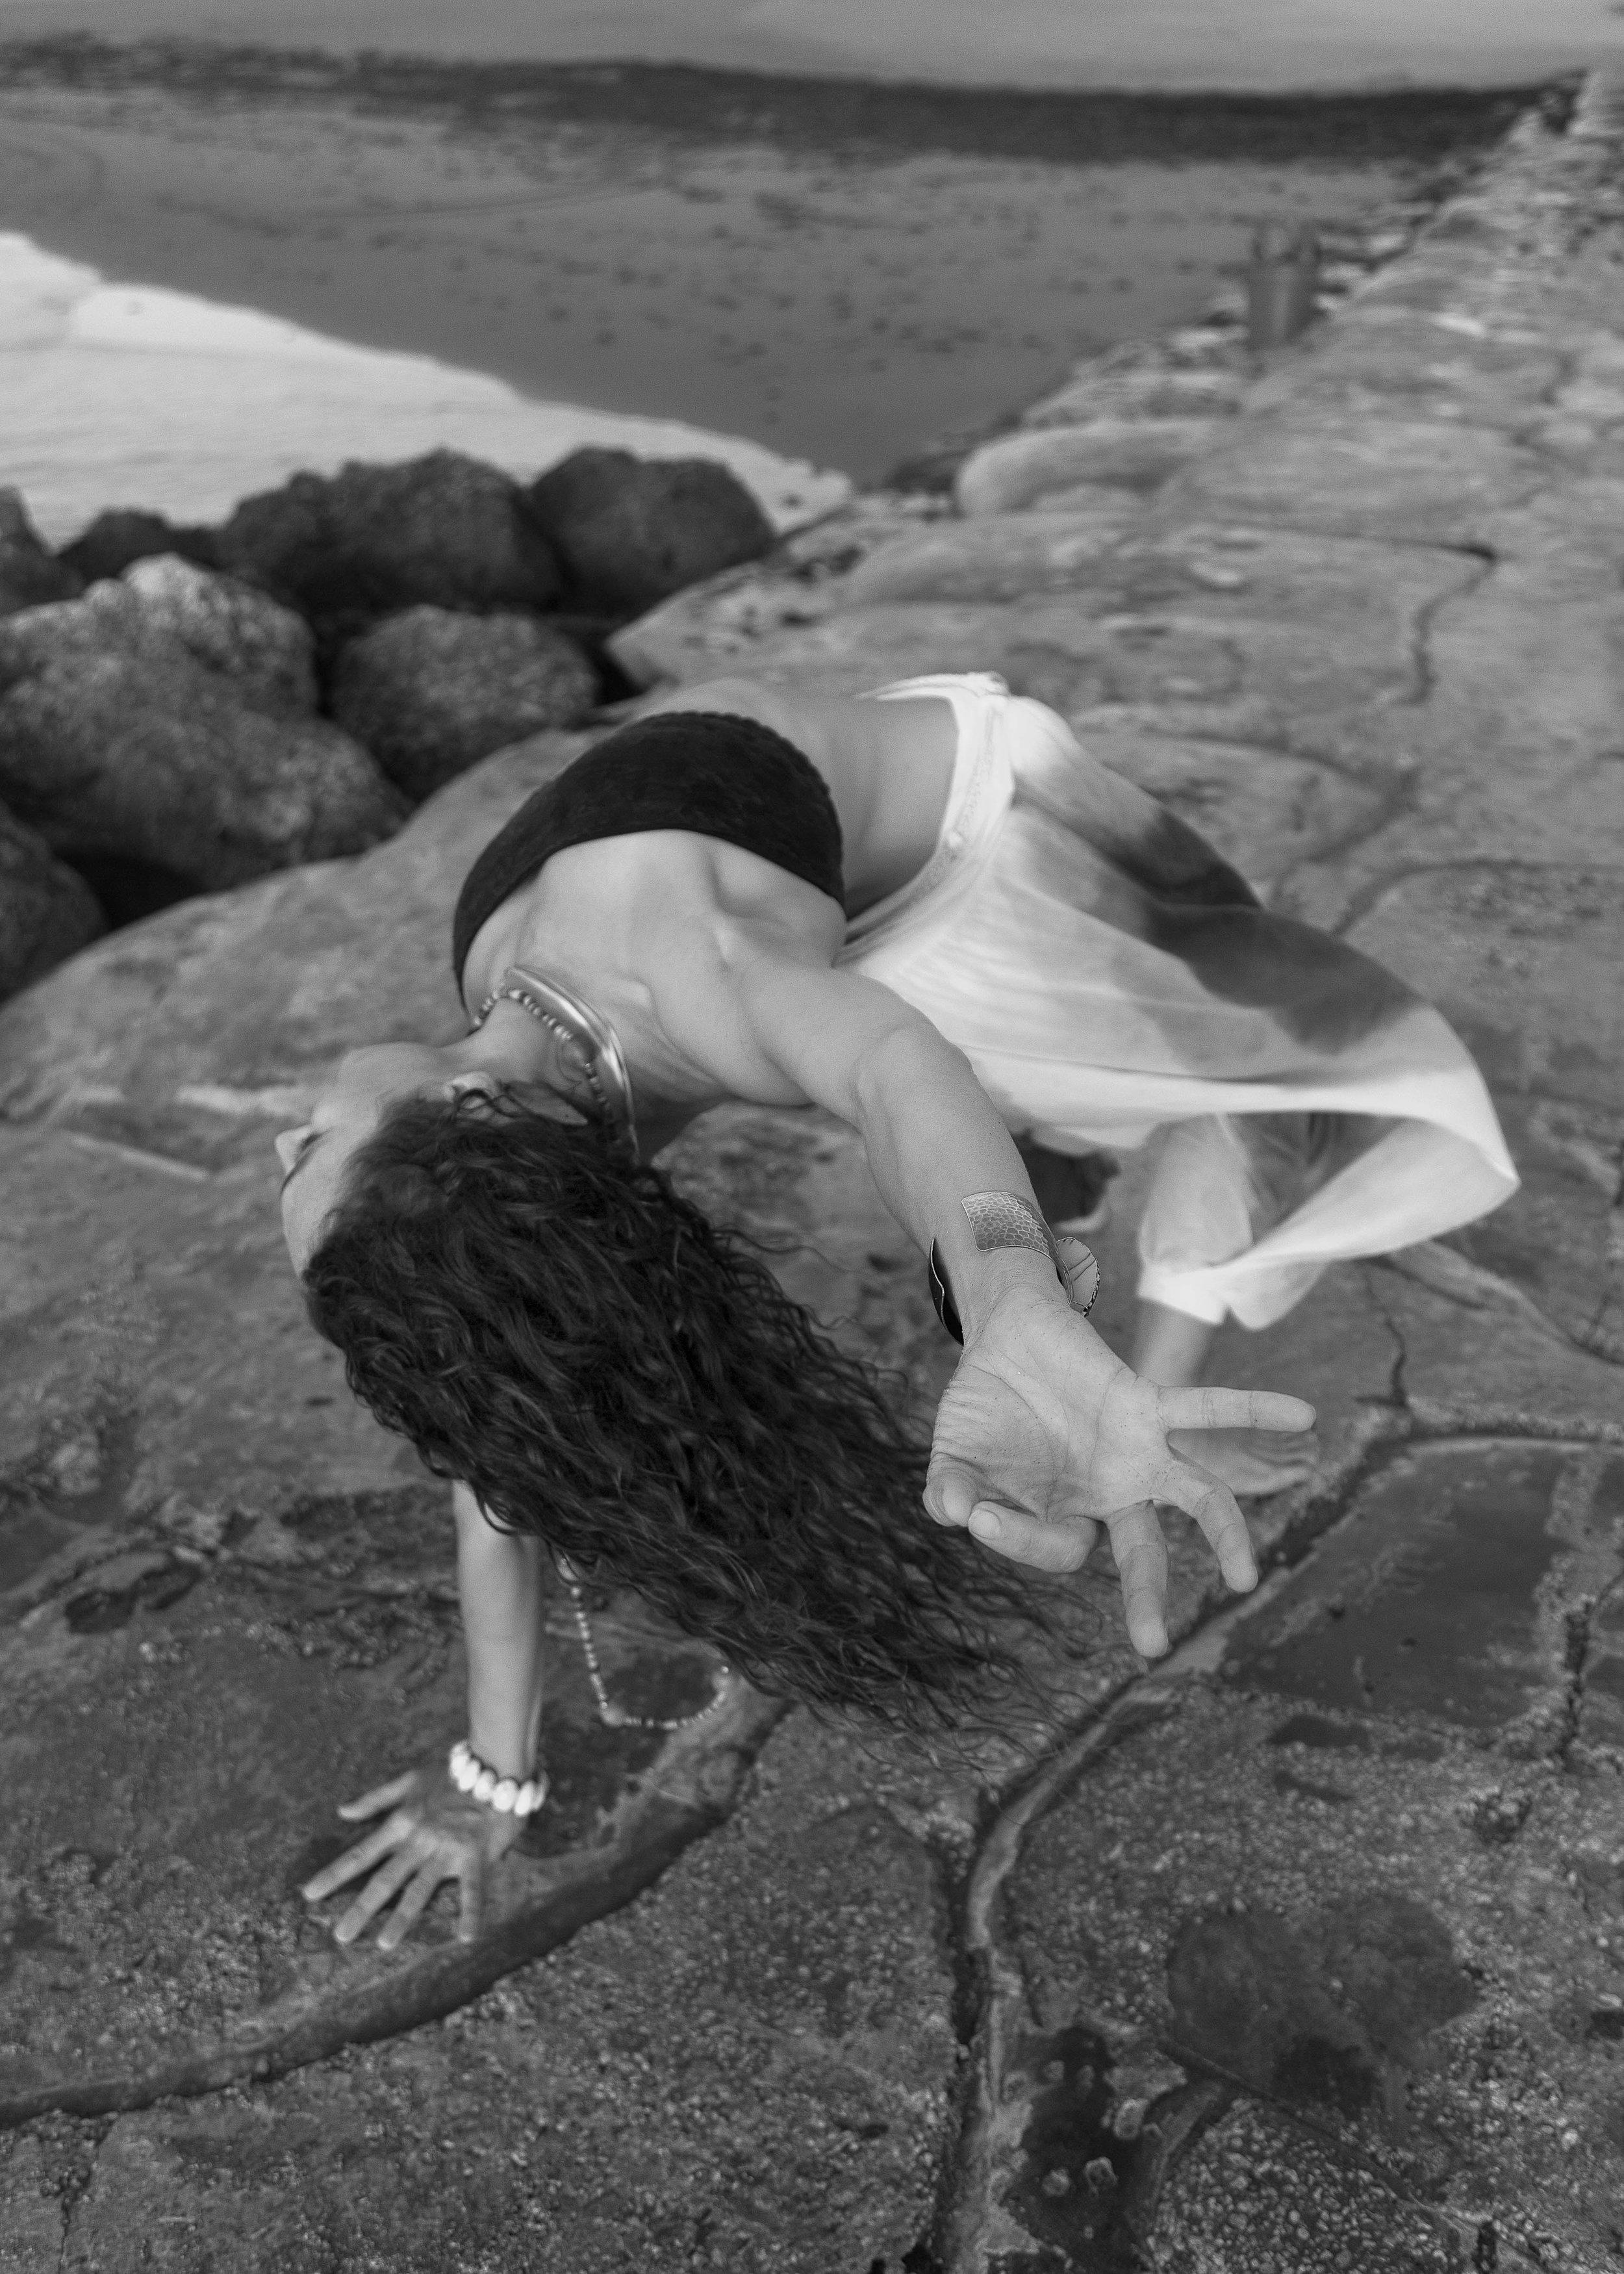 yoga-pose-photography-south-florida-black-and-white.jpg